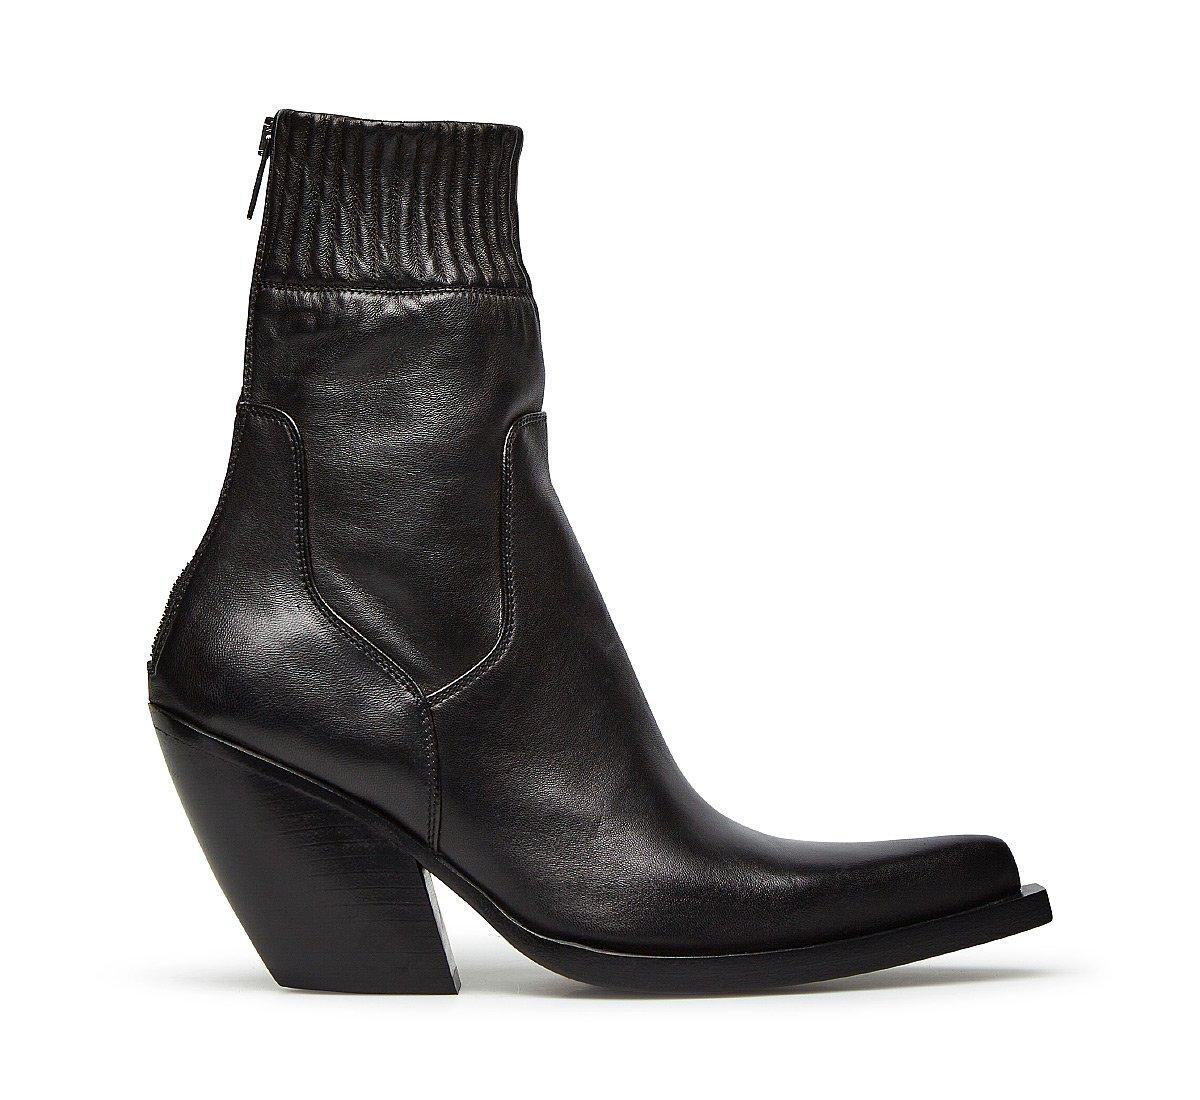 Barracuda soft nappa cowboy boots